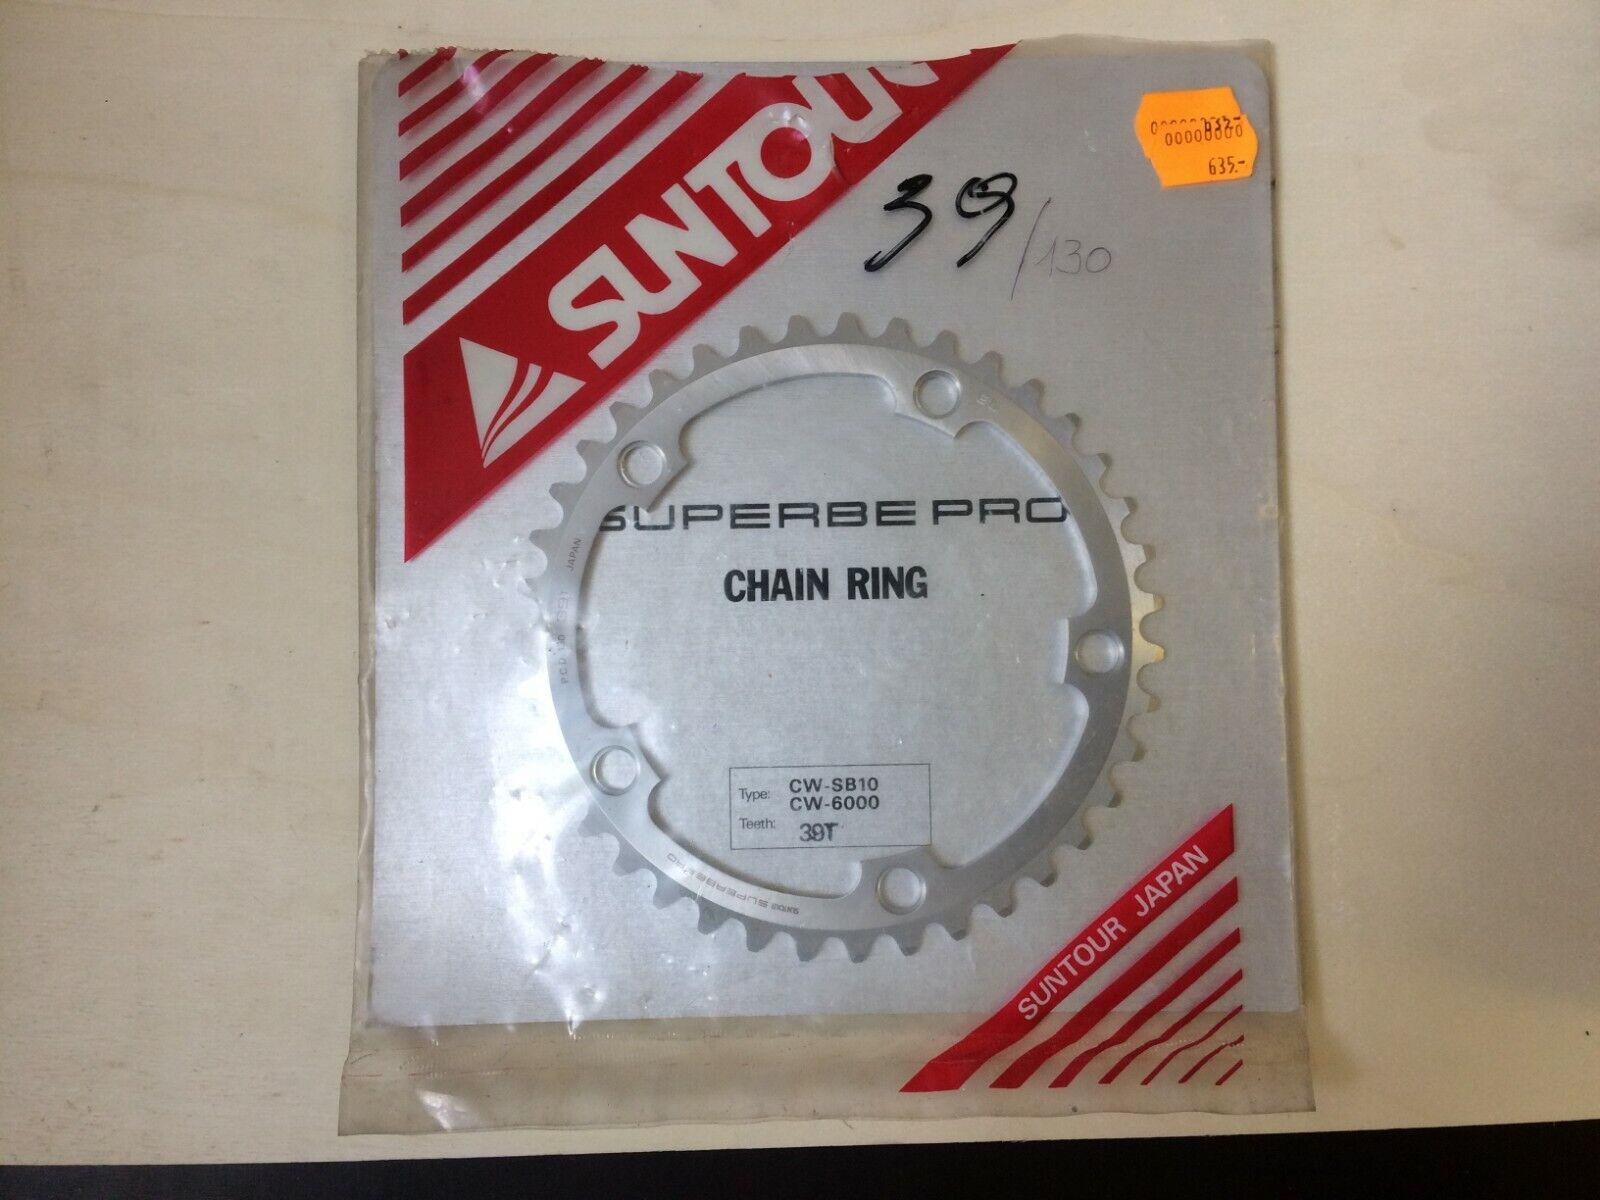 Suntour Suberbe Pro Chain ring Kettenblatt 39T, 130mm,